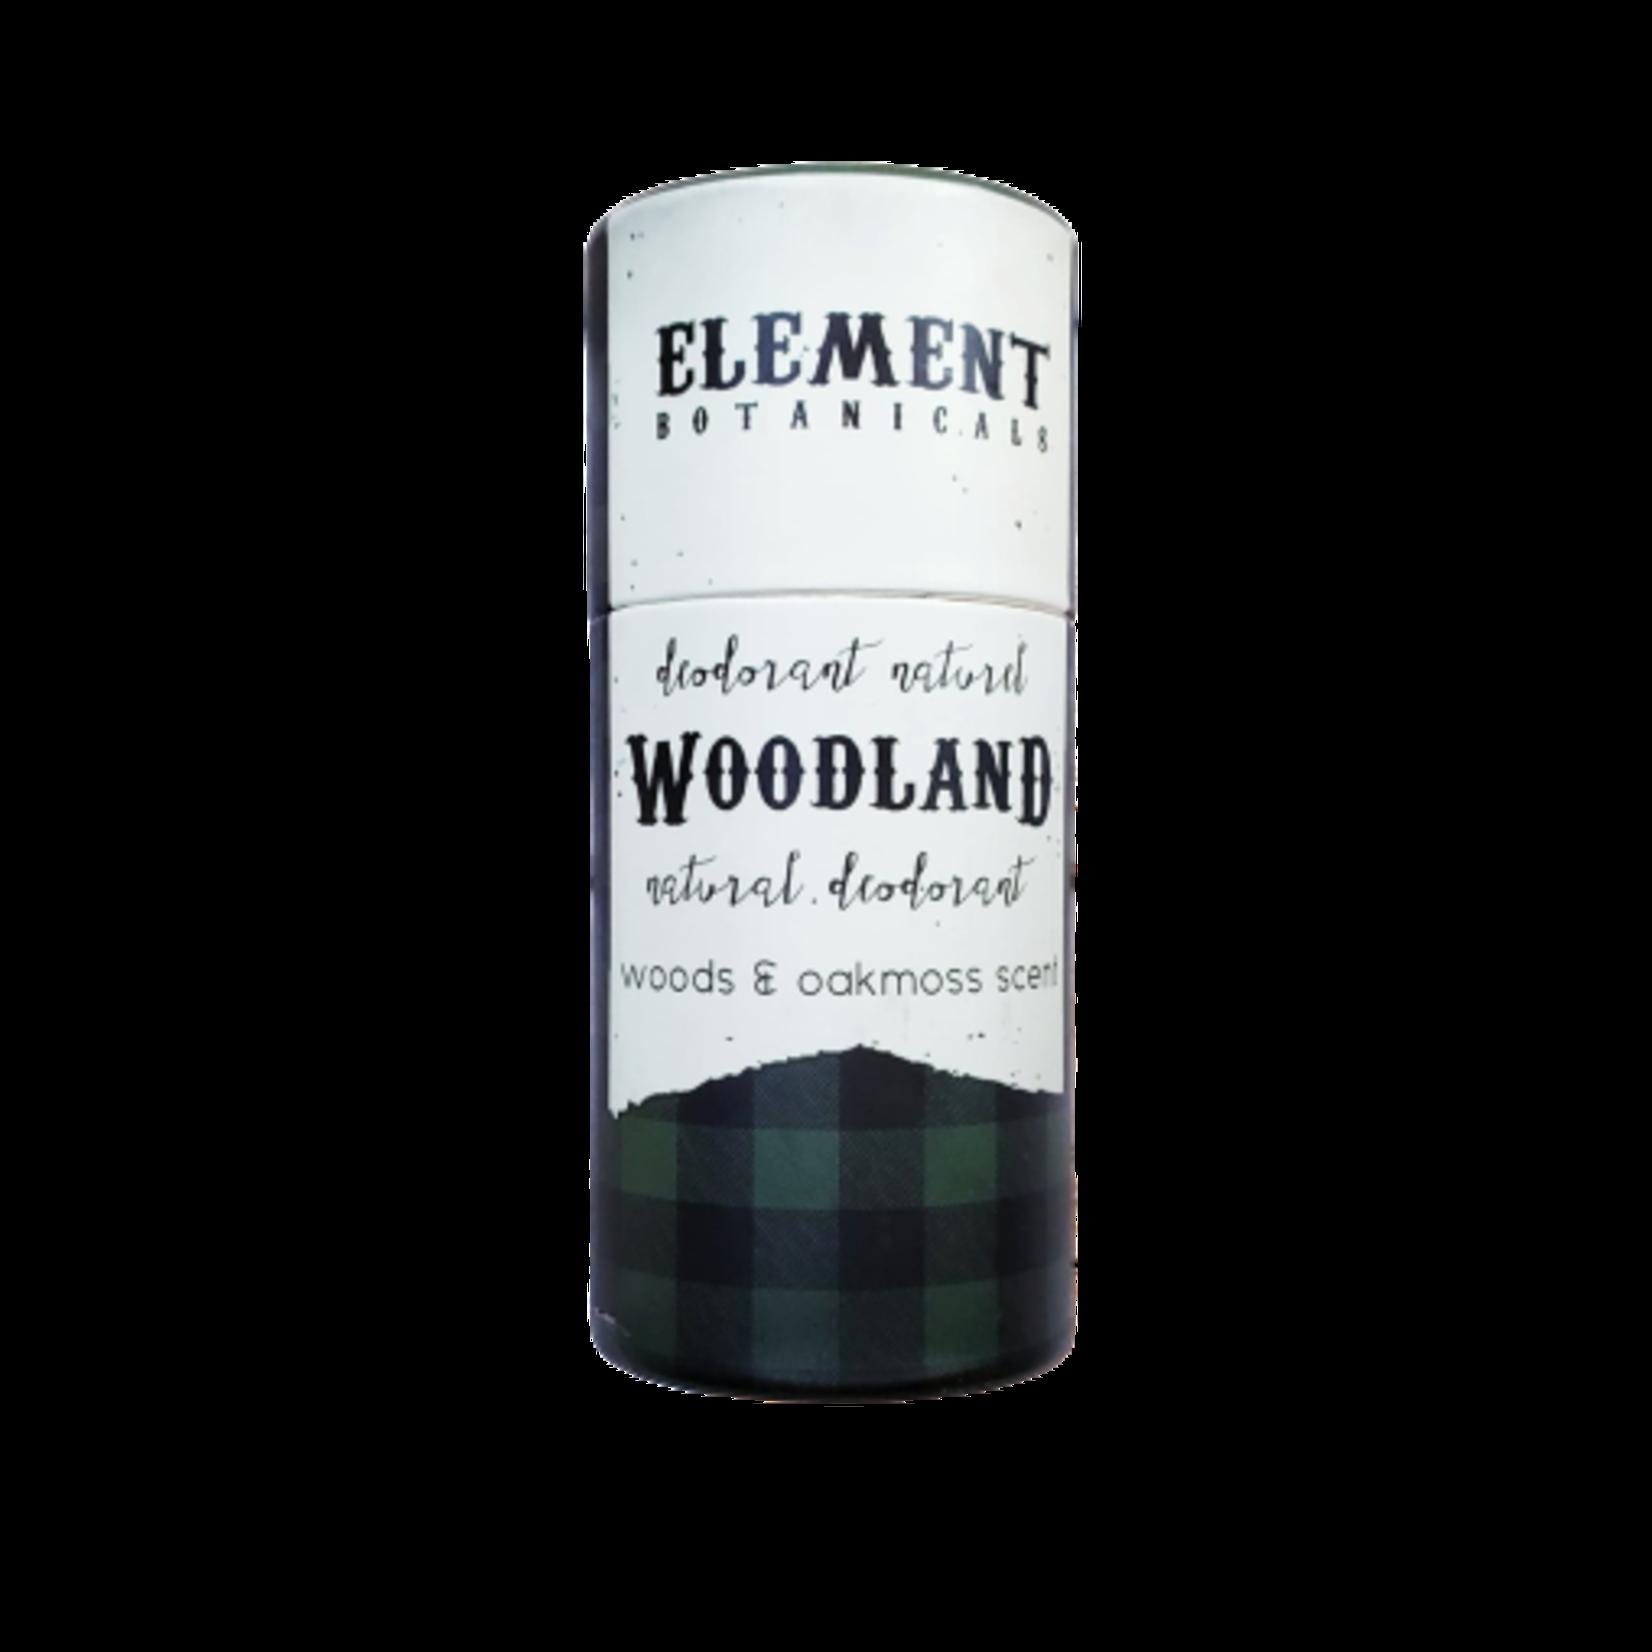 ELEMENT BOTANICALS Woodland Deodorant